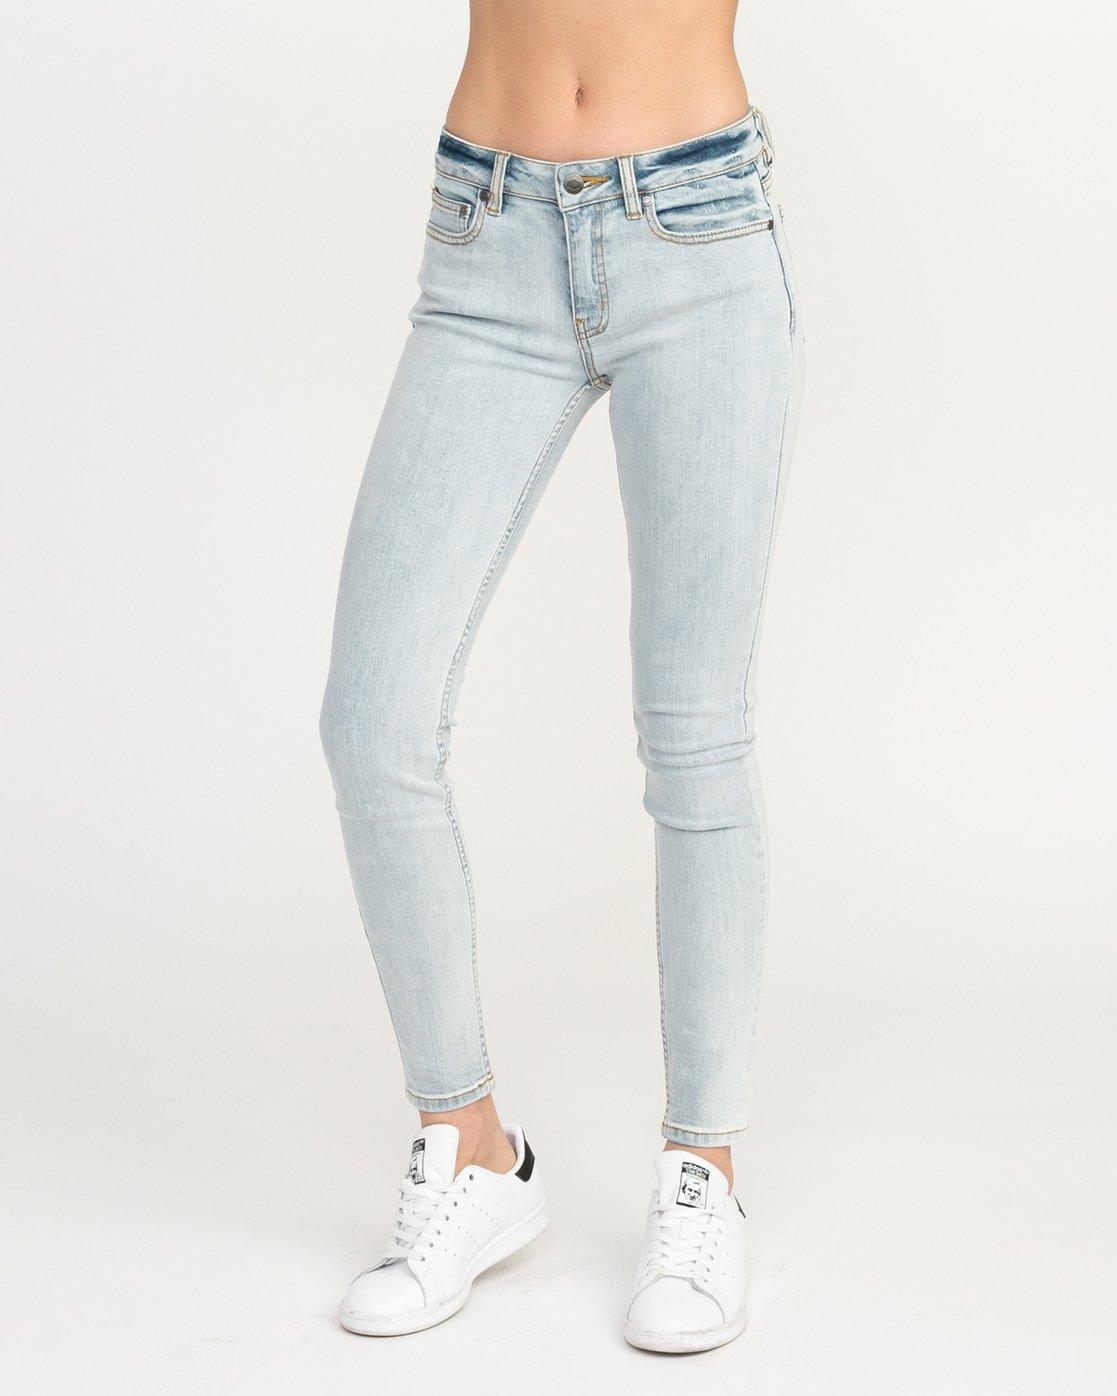 0 Dayley Mid Rise Denim Jeans White WCDP02DA RVCA